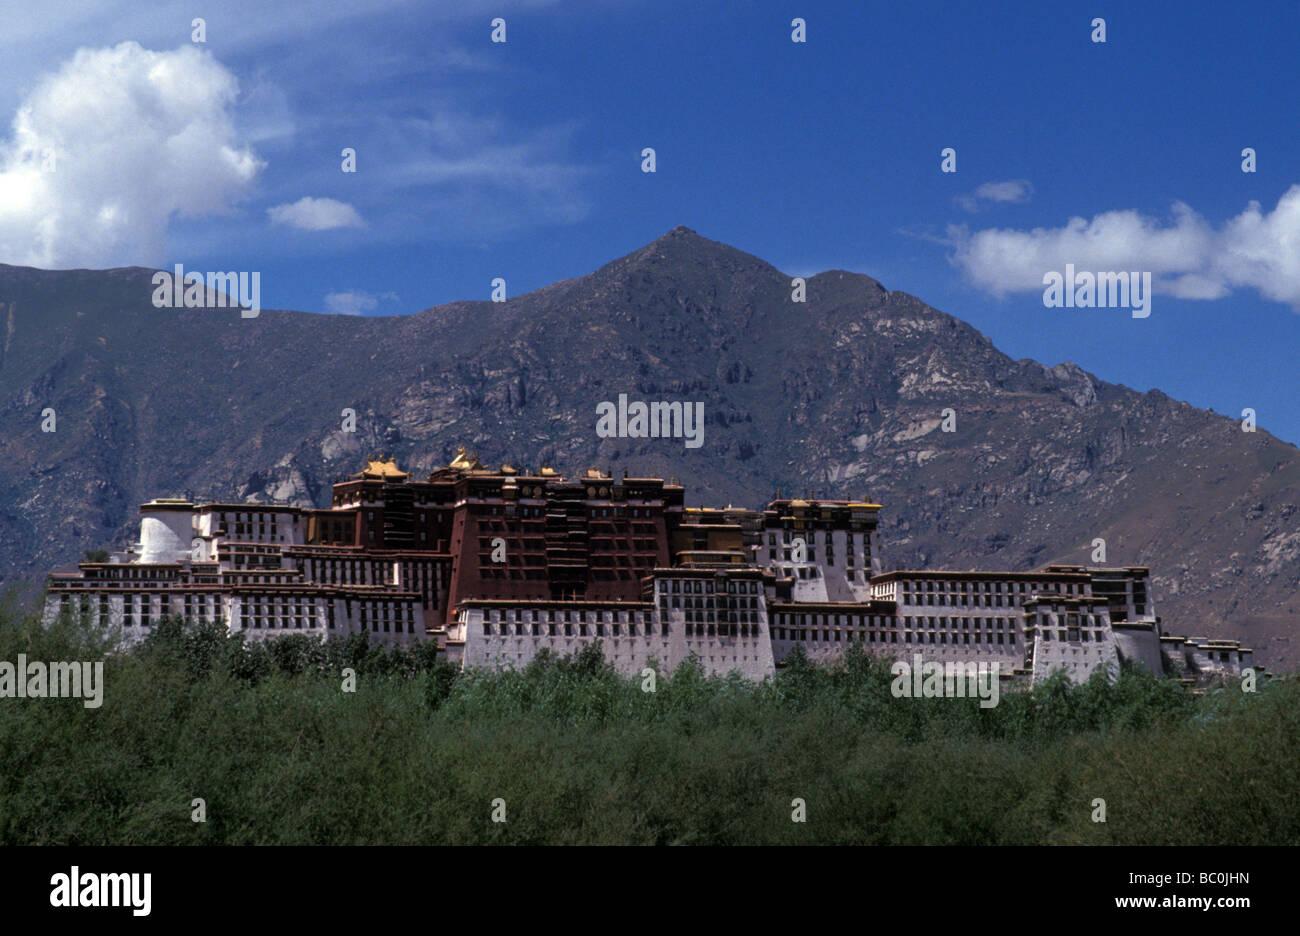 Potala Palace home of the Dalai Lama Lhasa Tibet Autonomous Region Peoples Republic of China - Stock Image